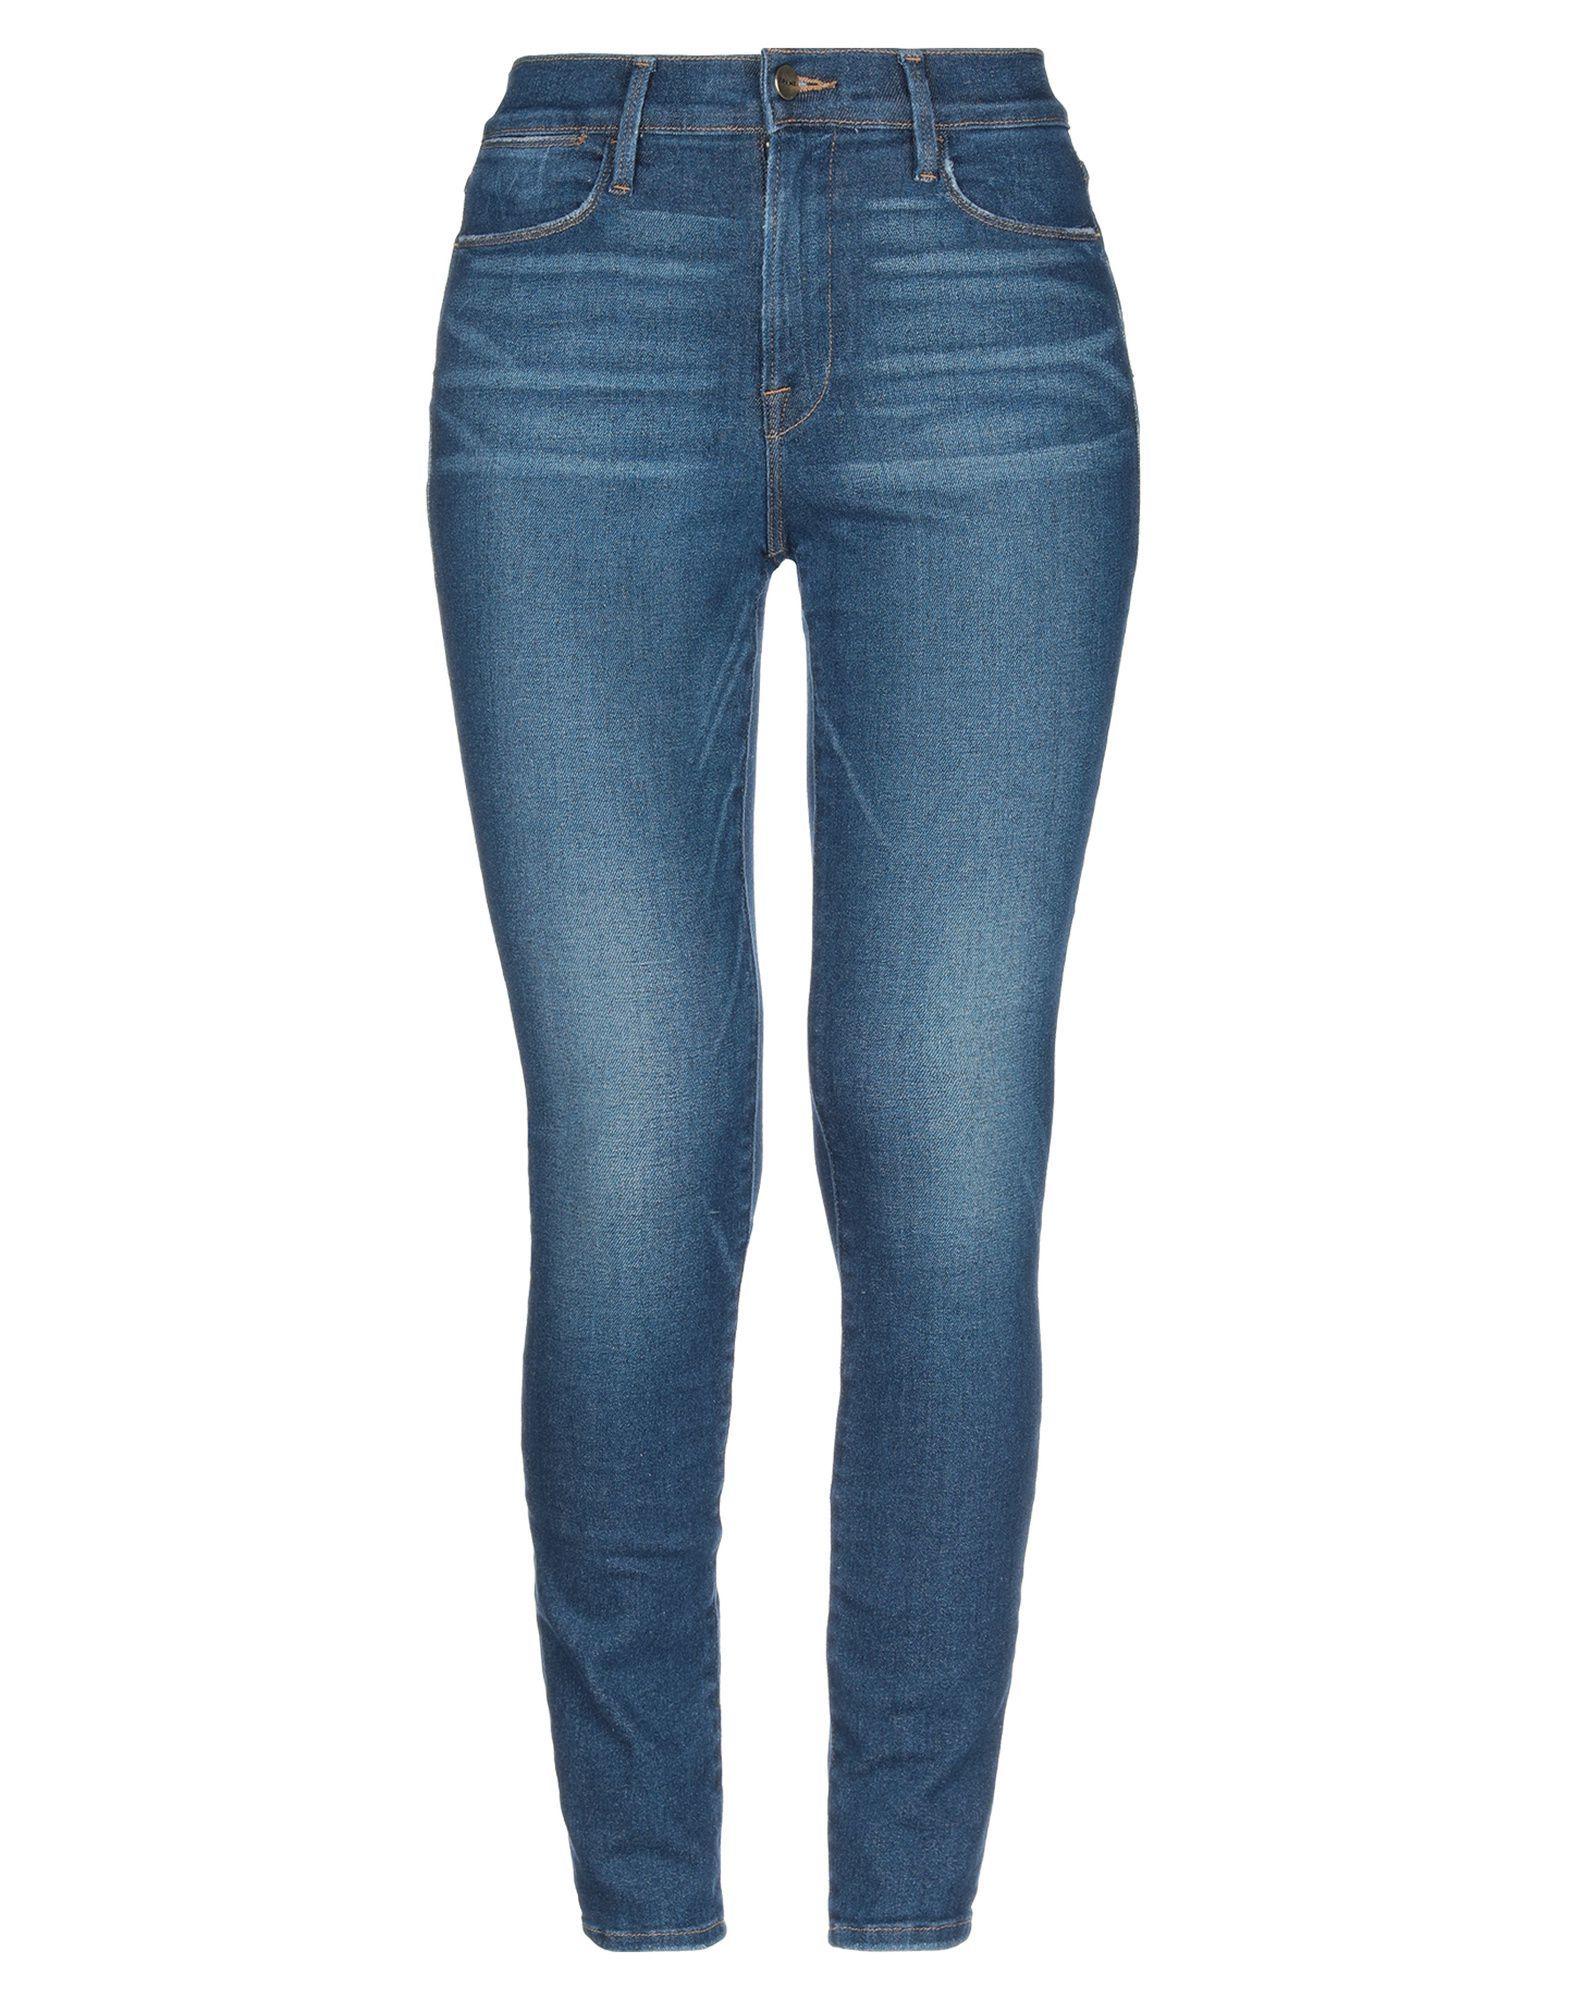 Frame Blue Cotton High Waisted Skinny Jeans